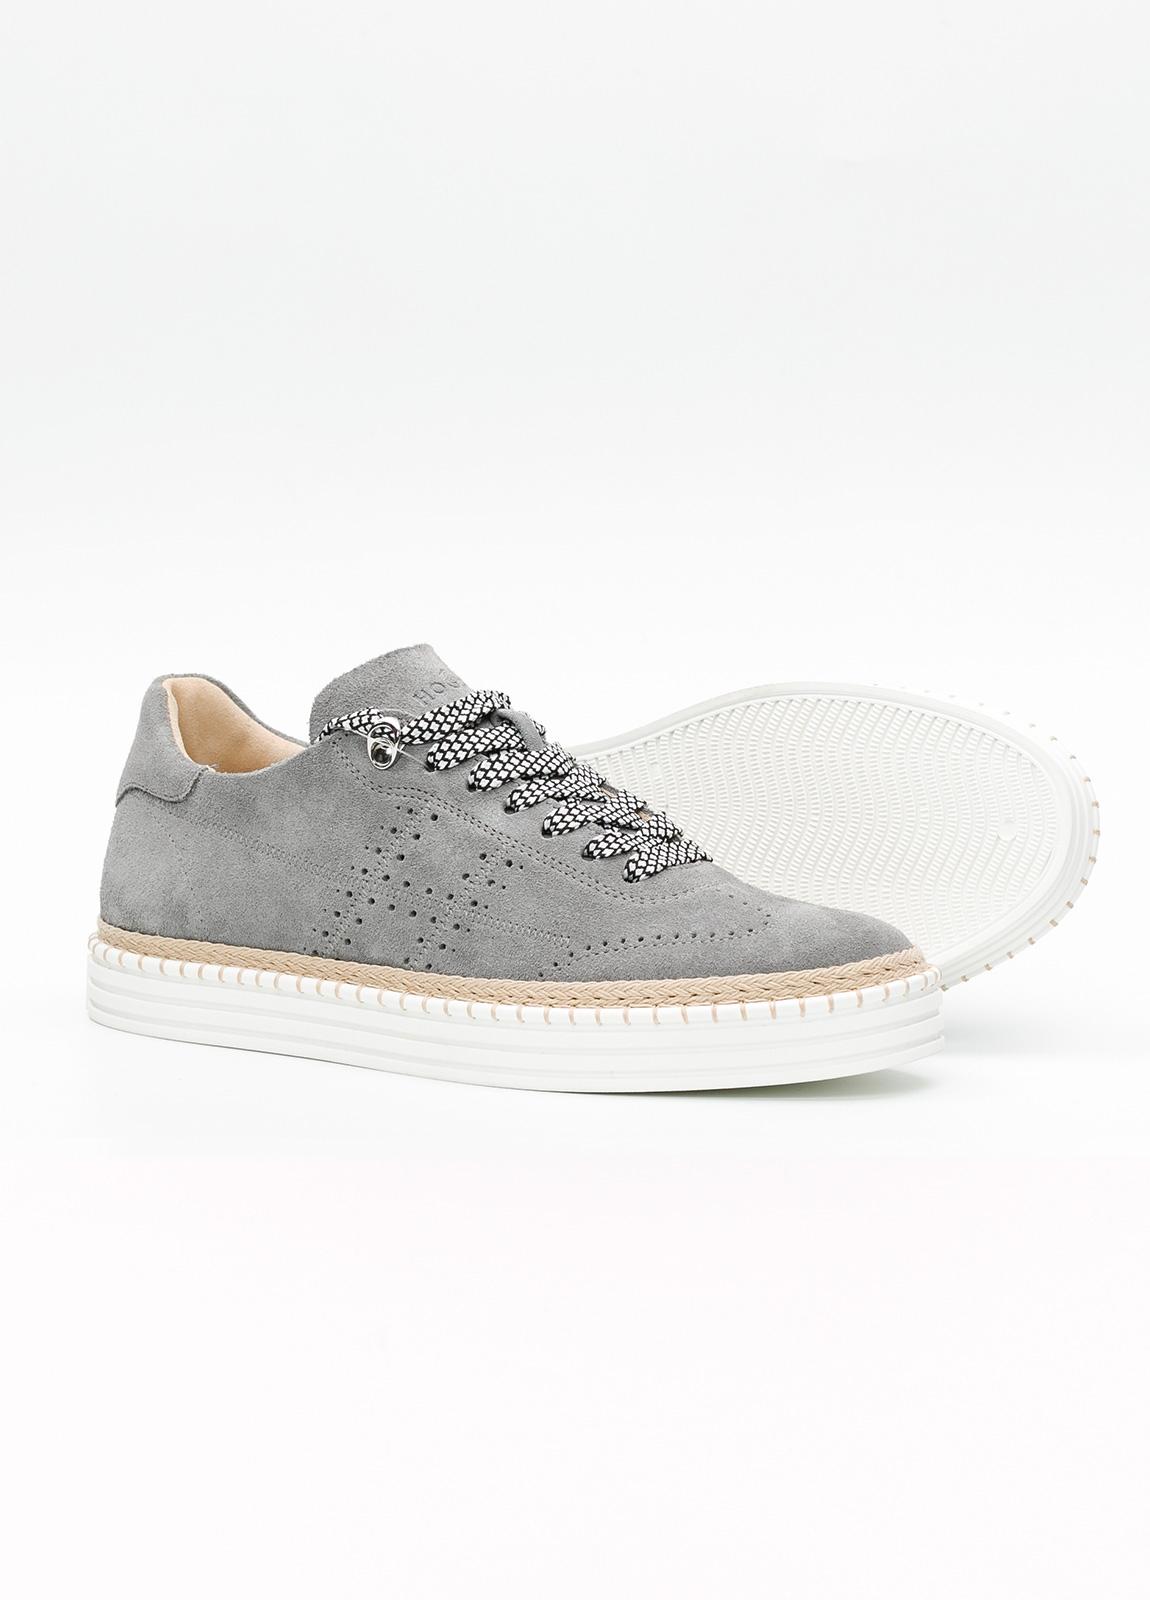 Calzado sport hombre R260 color gris. 100% Serraje. - Ítem2